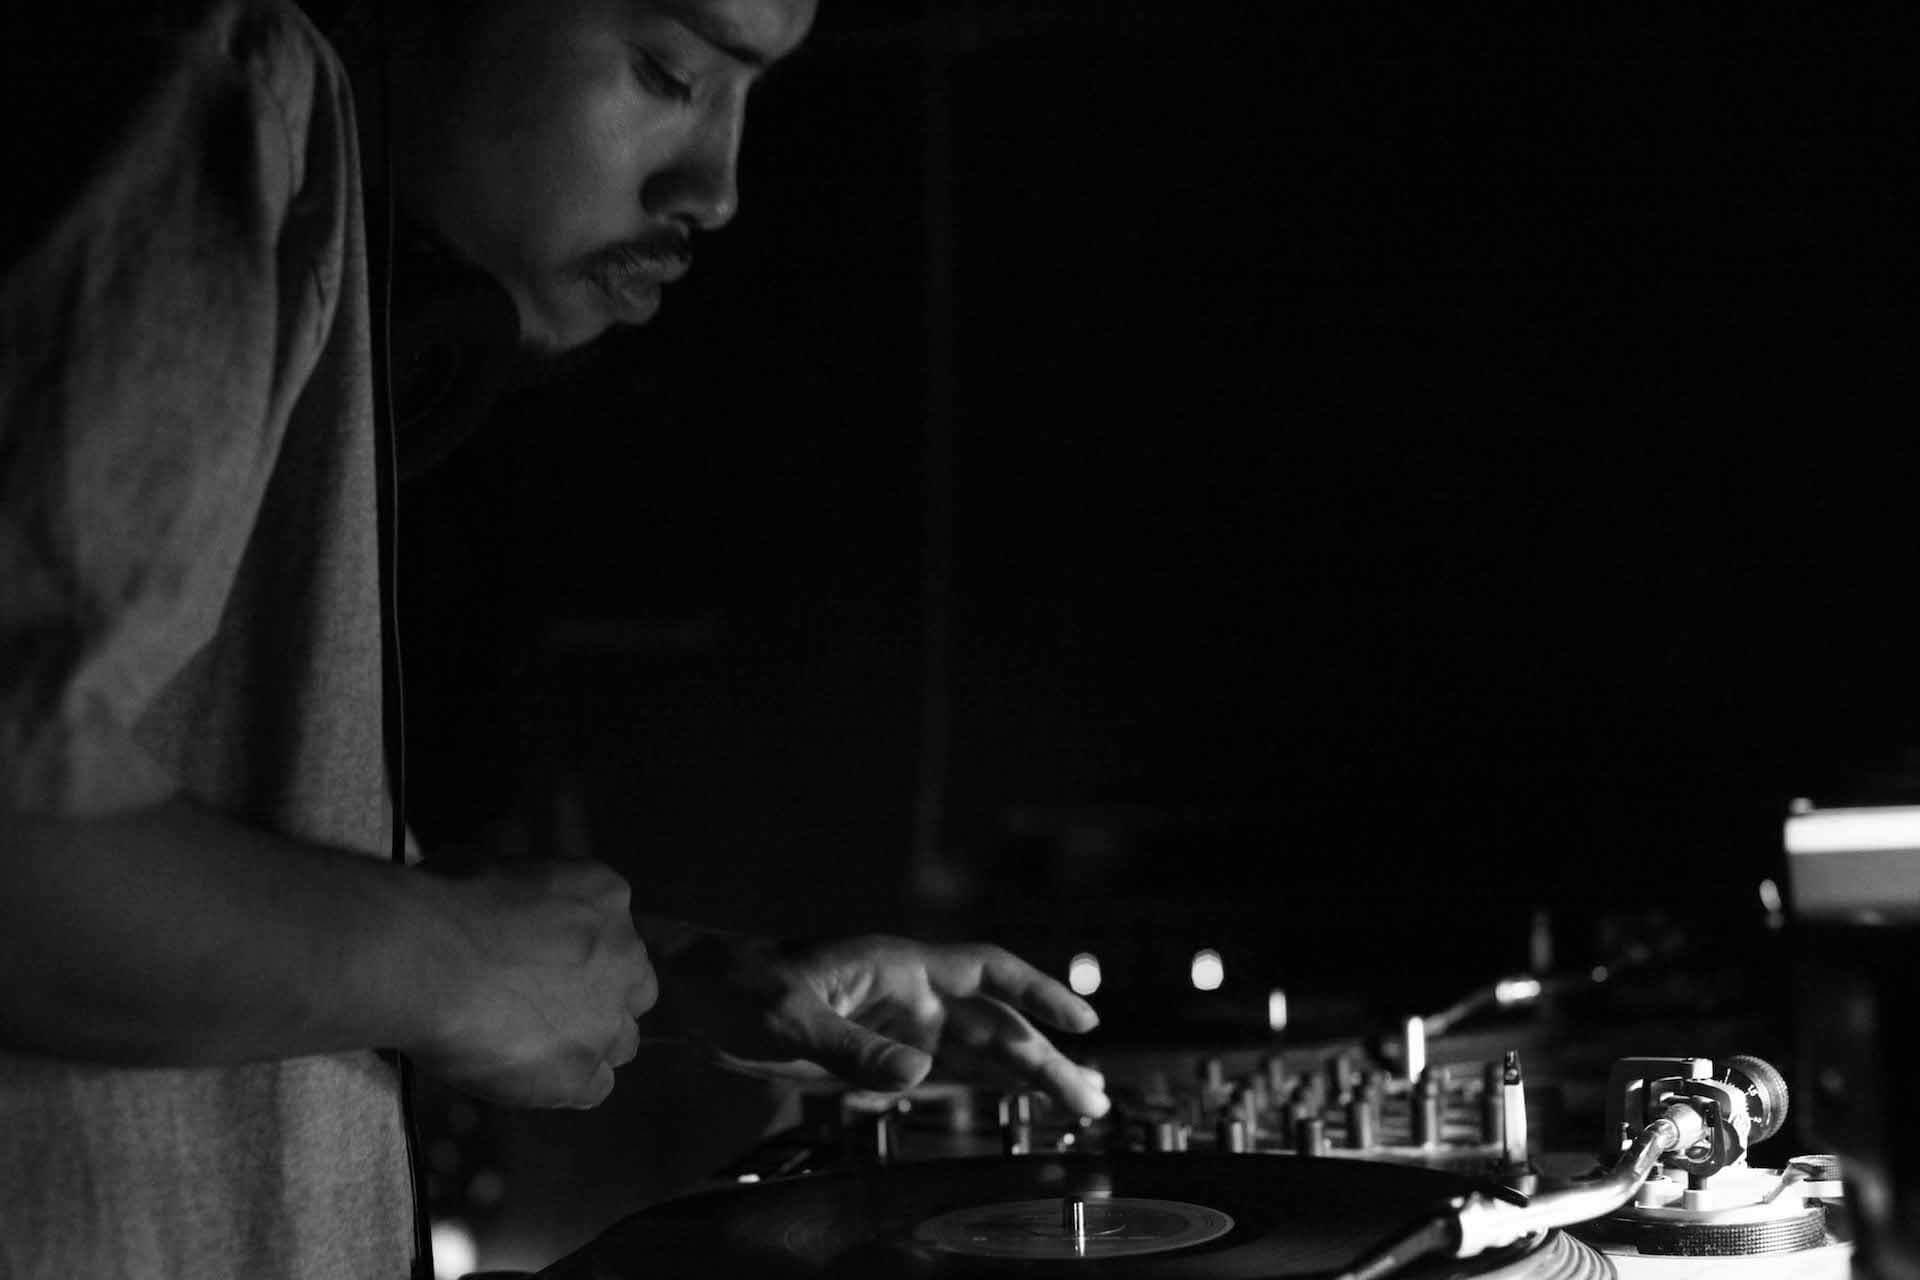 ISSUGI & DJ SHOEのミックスアルバム『Both Banks』がついにリリース!BLACKFILEでのインタビュー映像が公開 music210728_issugi_djshoe_2